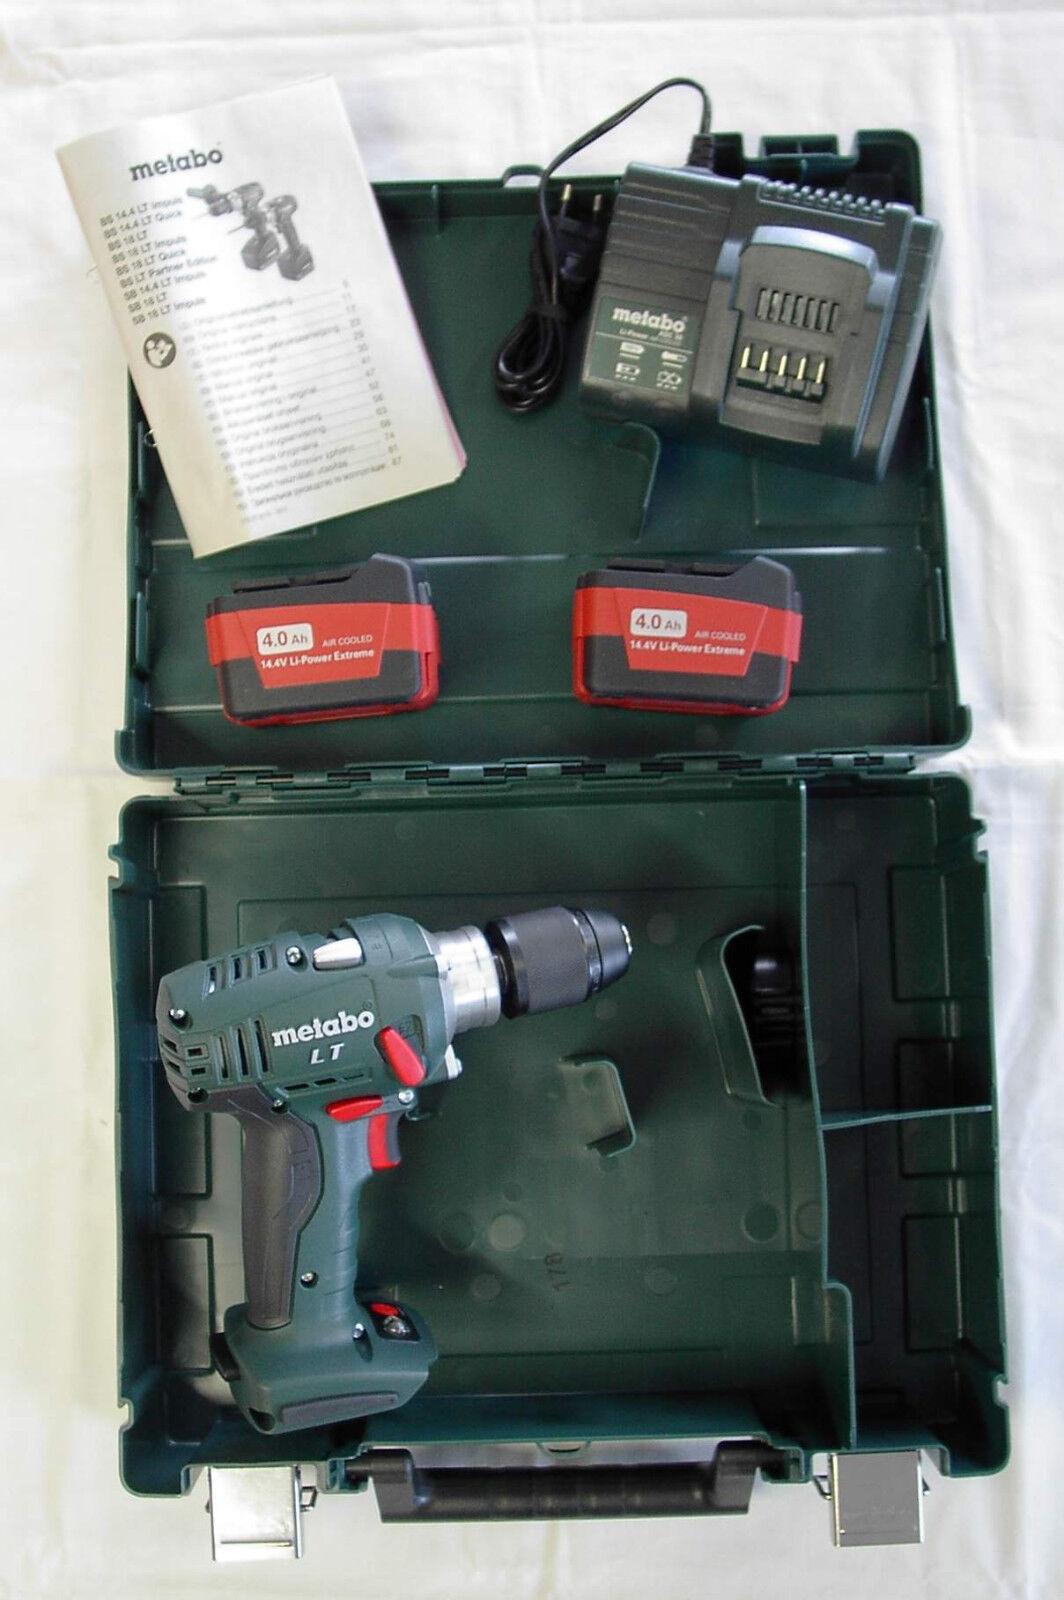 Metabo Akku-Bohrschrauber BS 14.4 LT mit 2 Akkus 4,0Ah 6.02137.61 ASC30